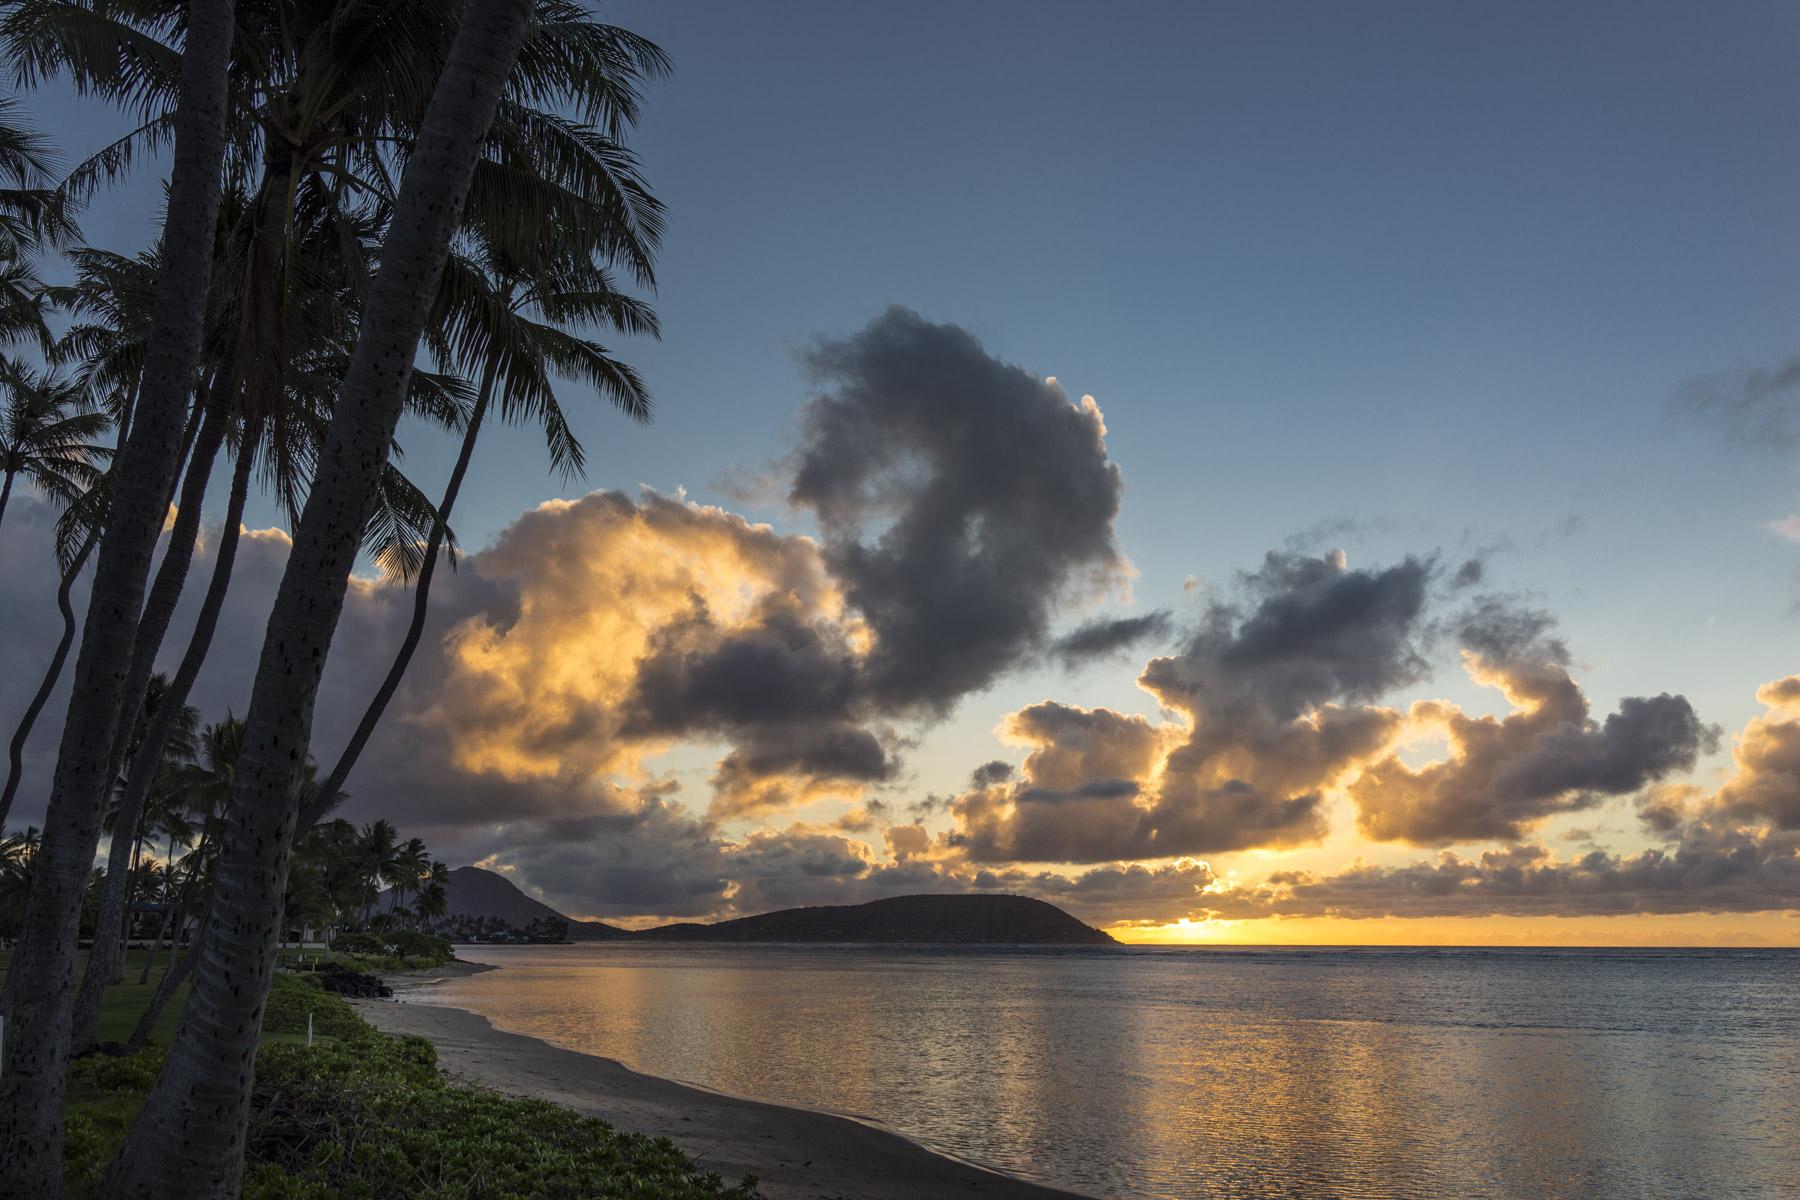 On the beach in Kahala, Honolulu, Hawaii